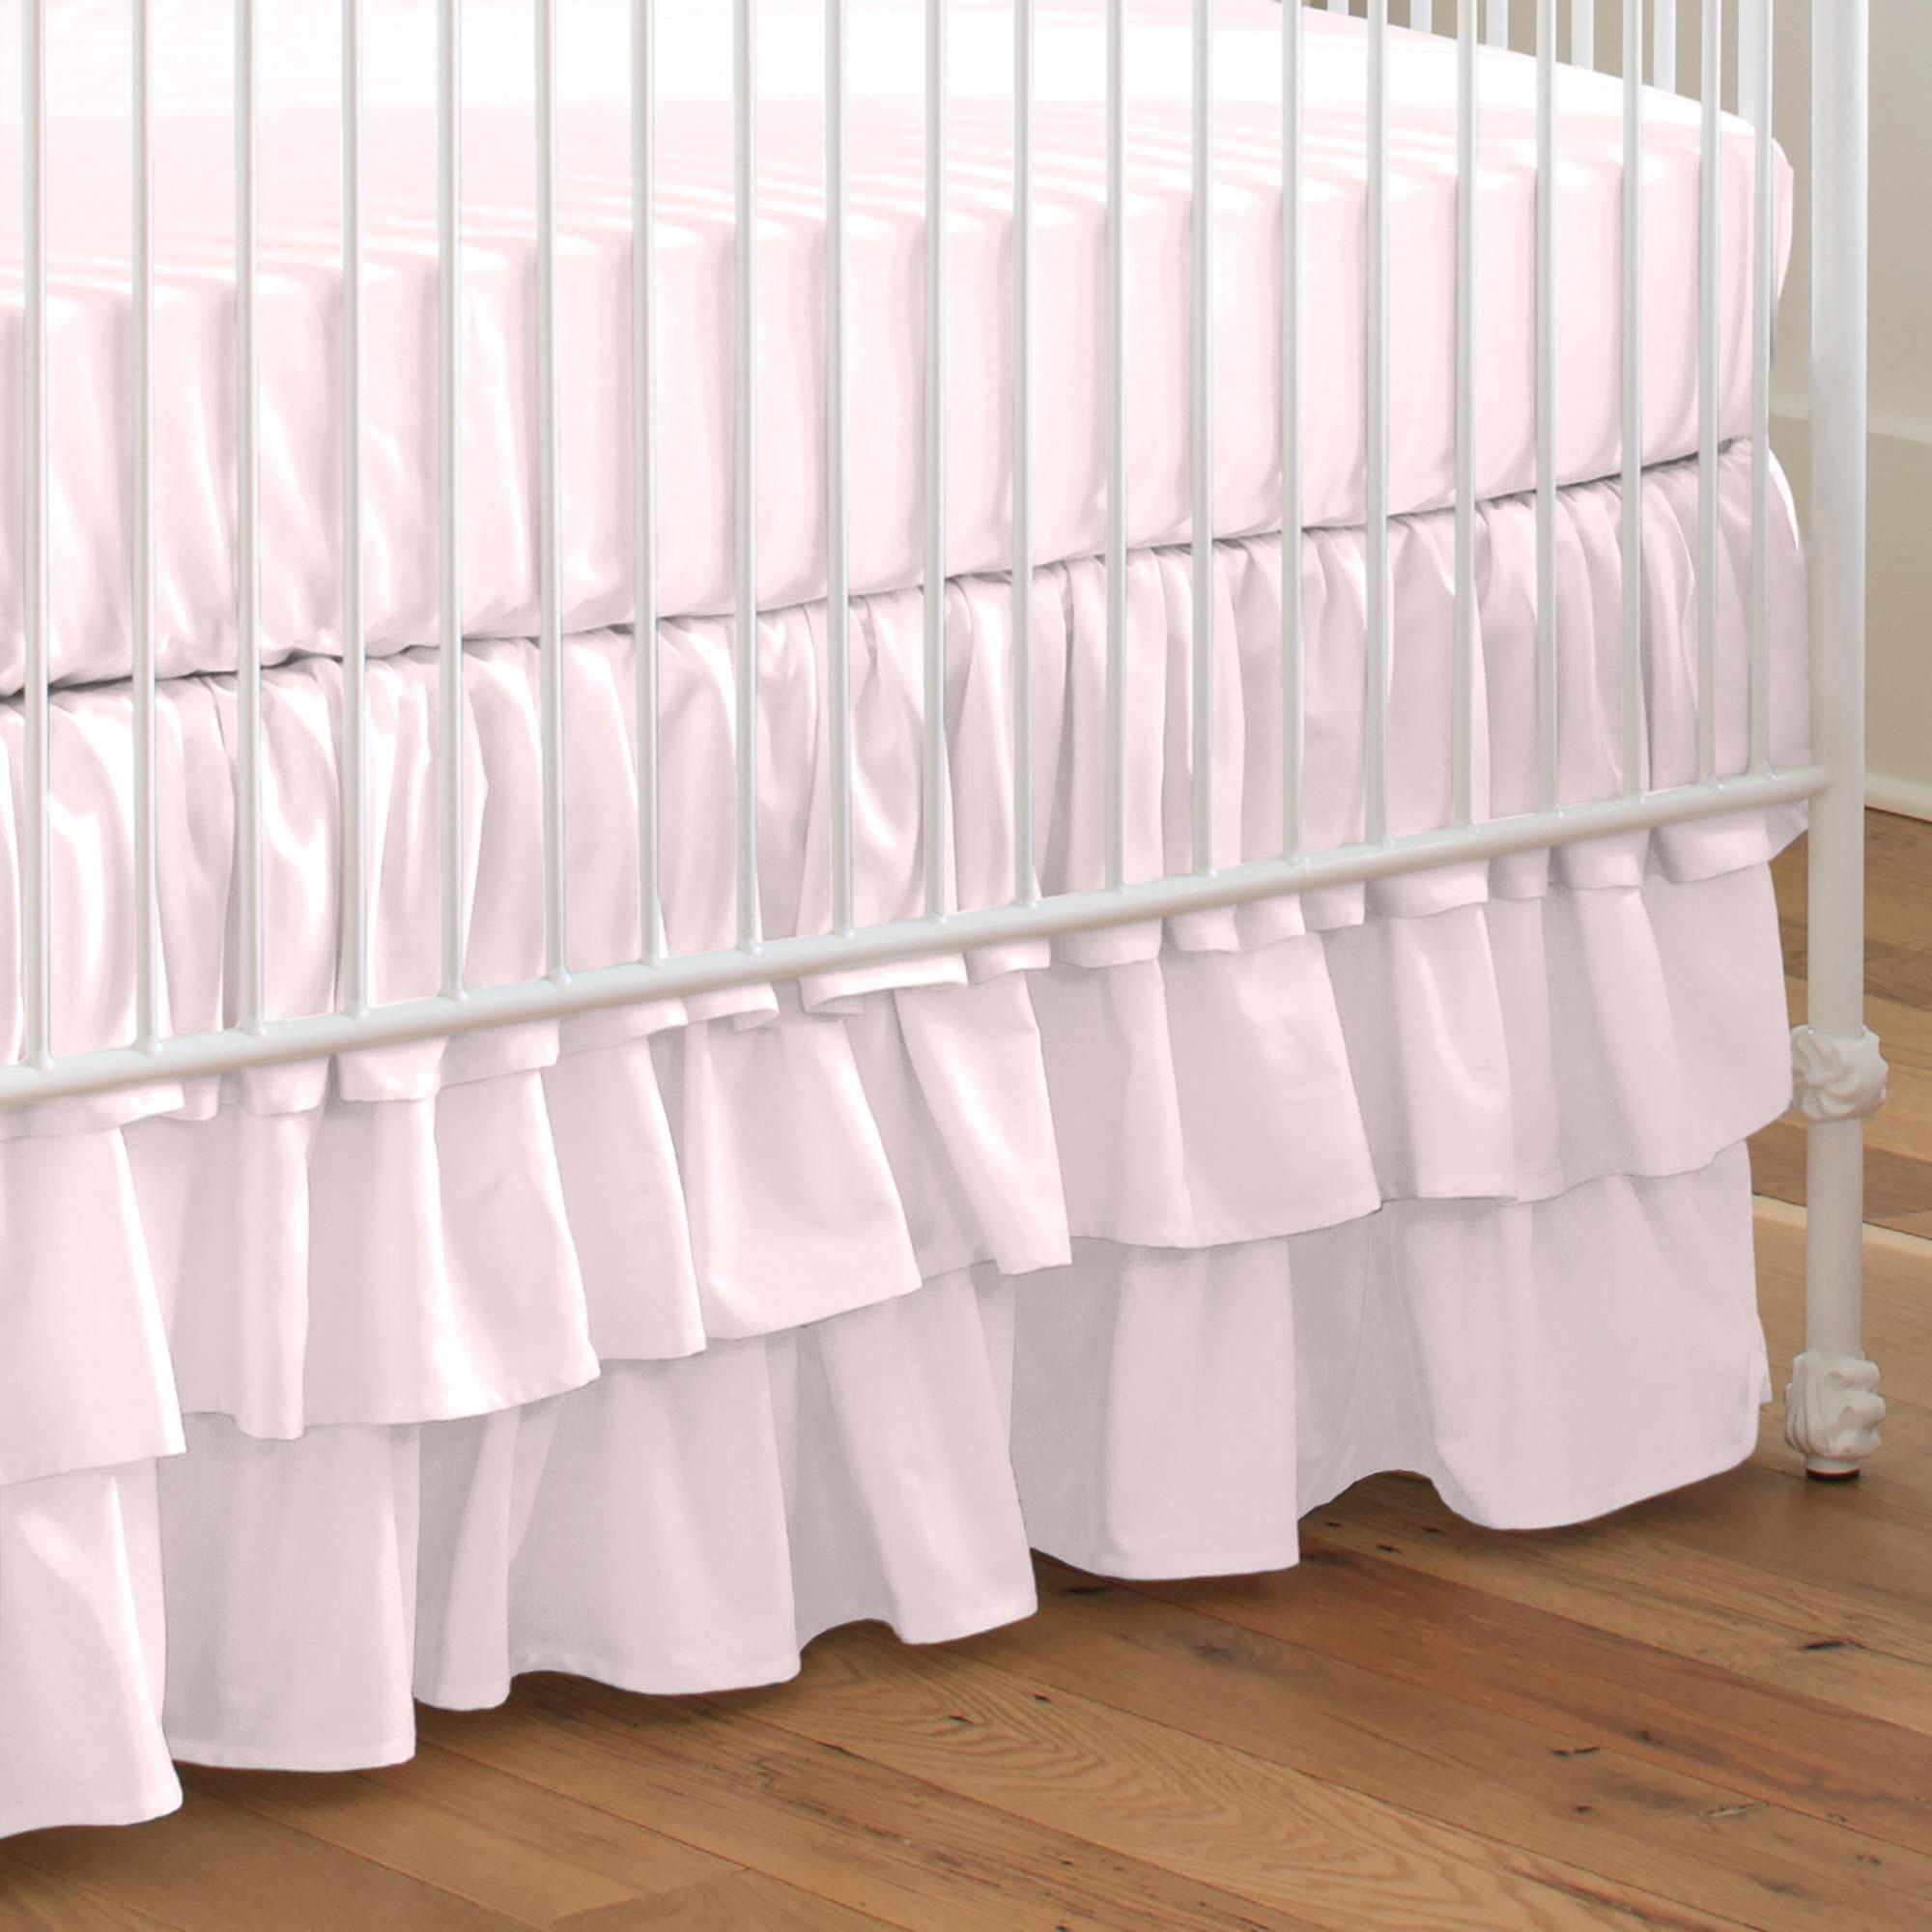 Carousel Designs Solid Pink Crib Skirt Three Tier 18-Inch Length